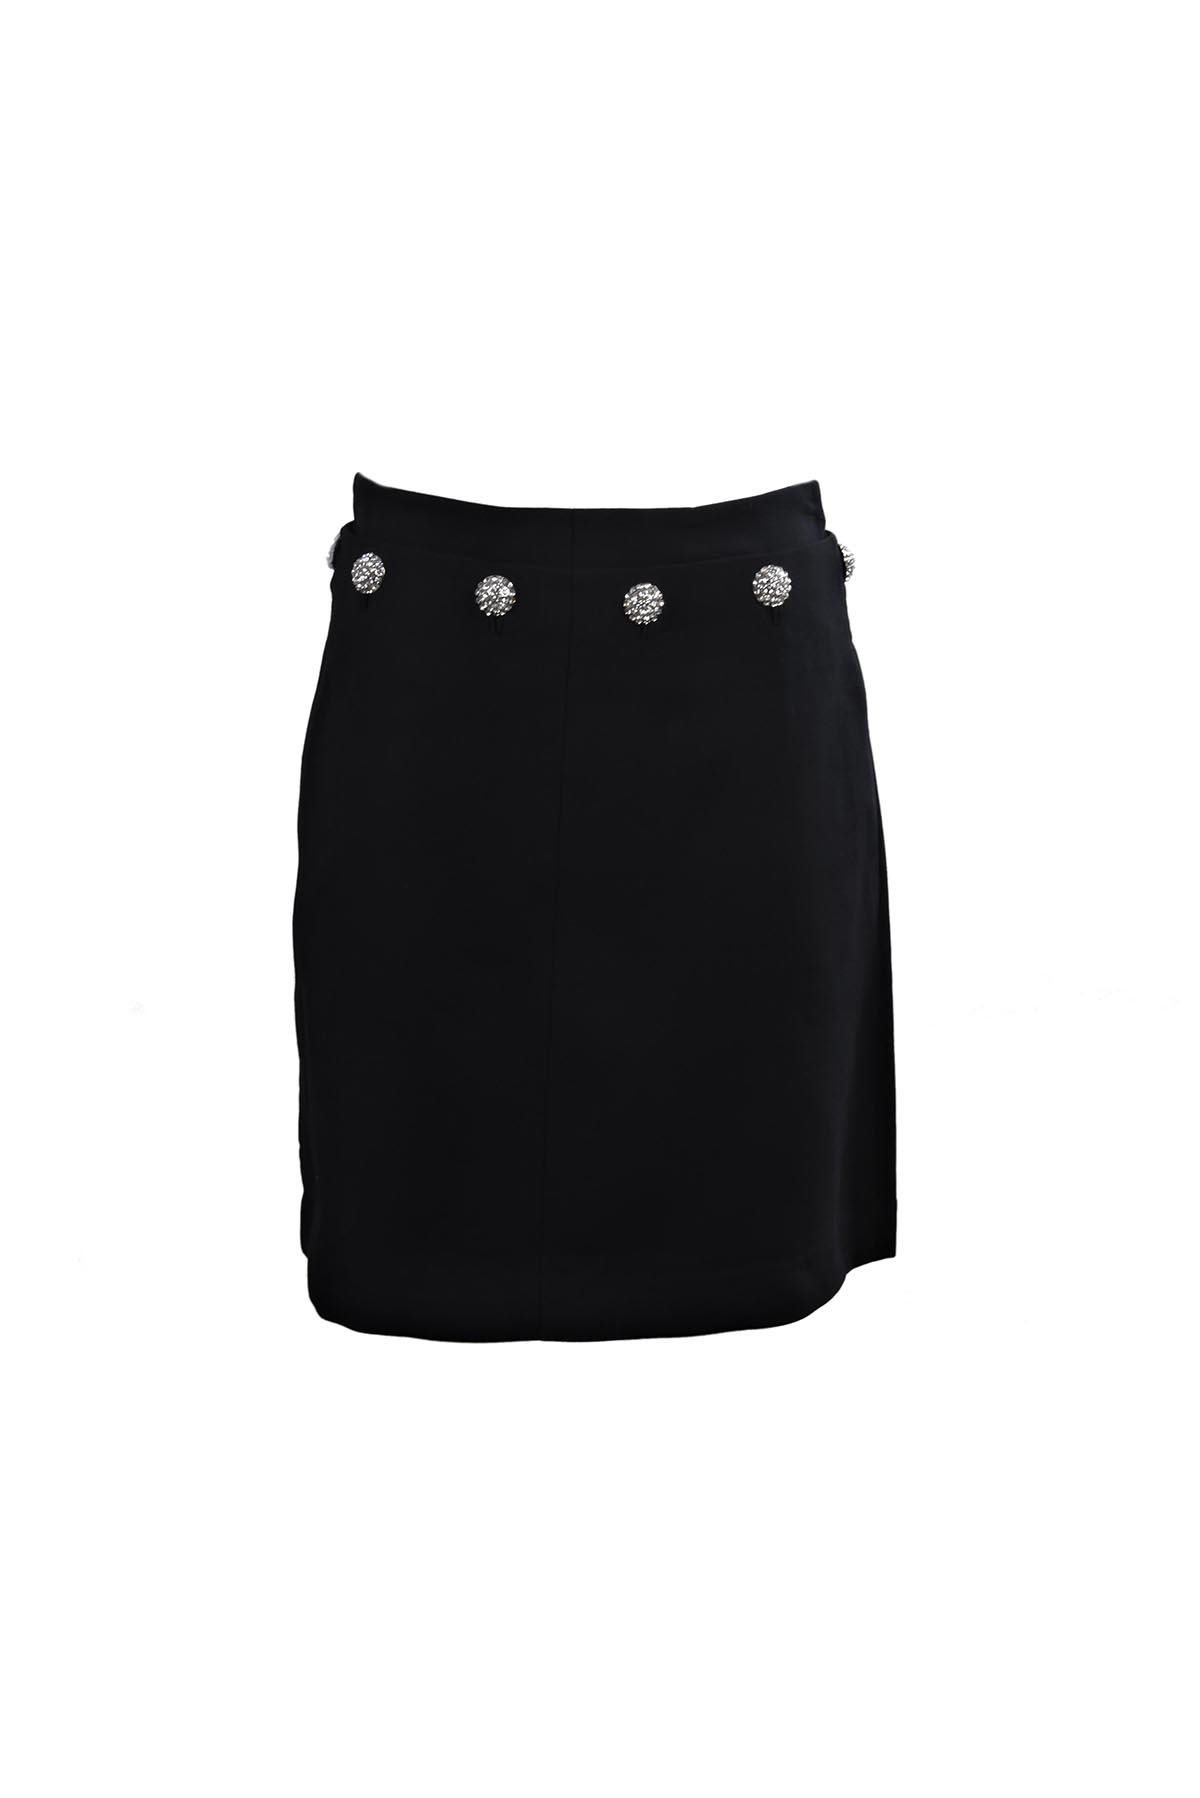 Tory Burch Fremont Skirt